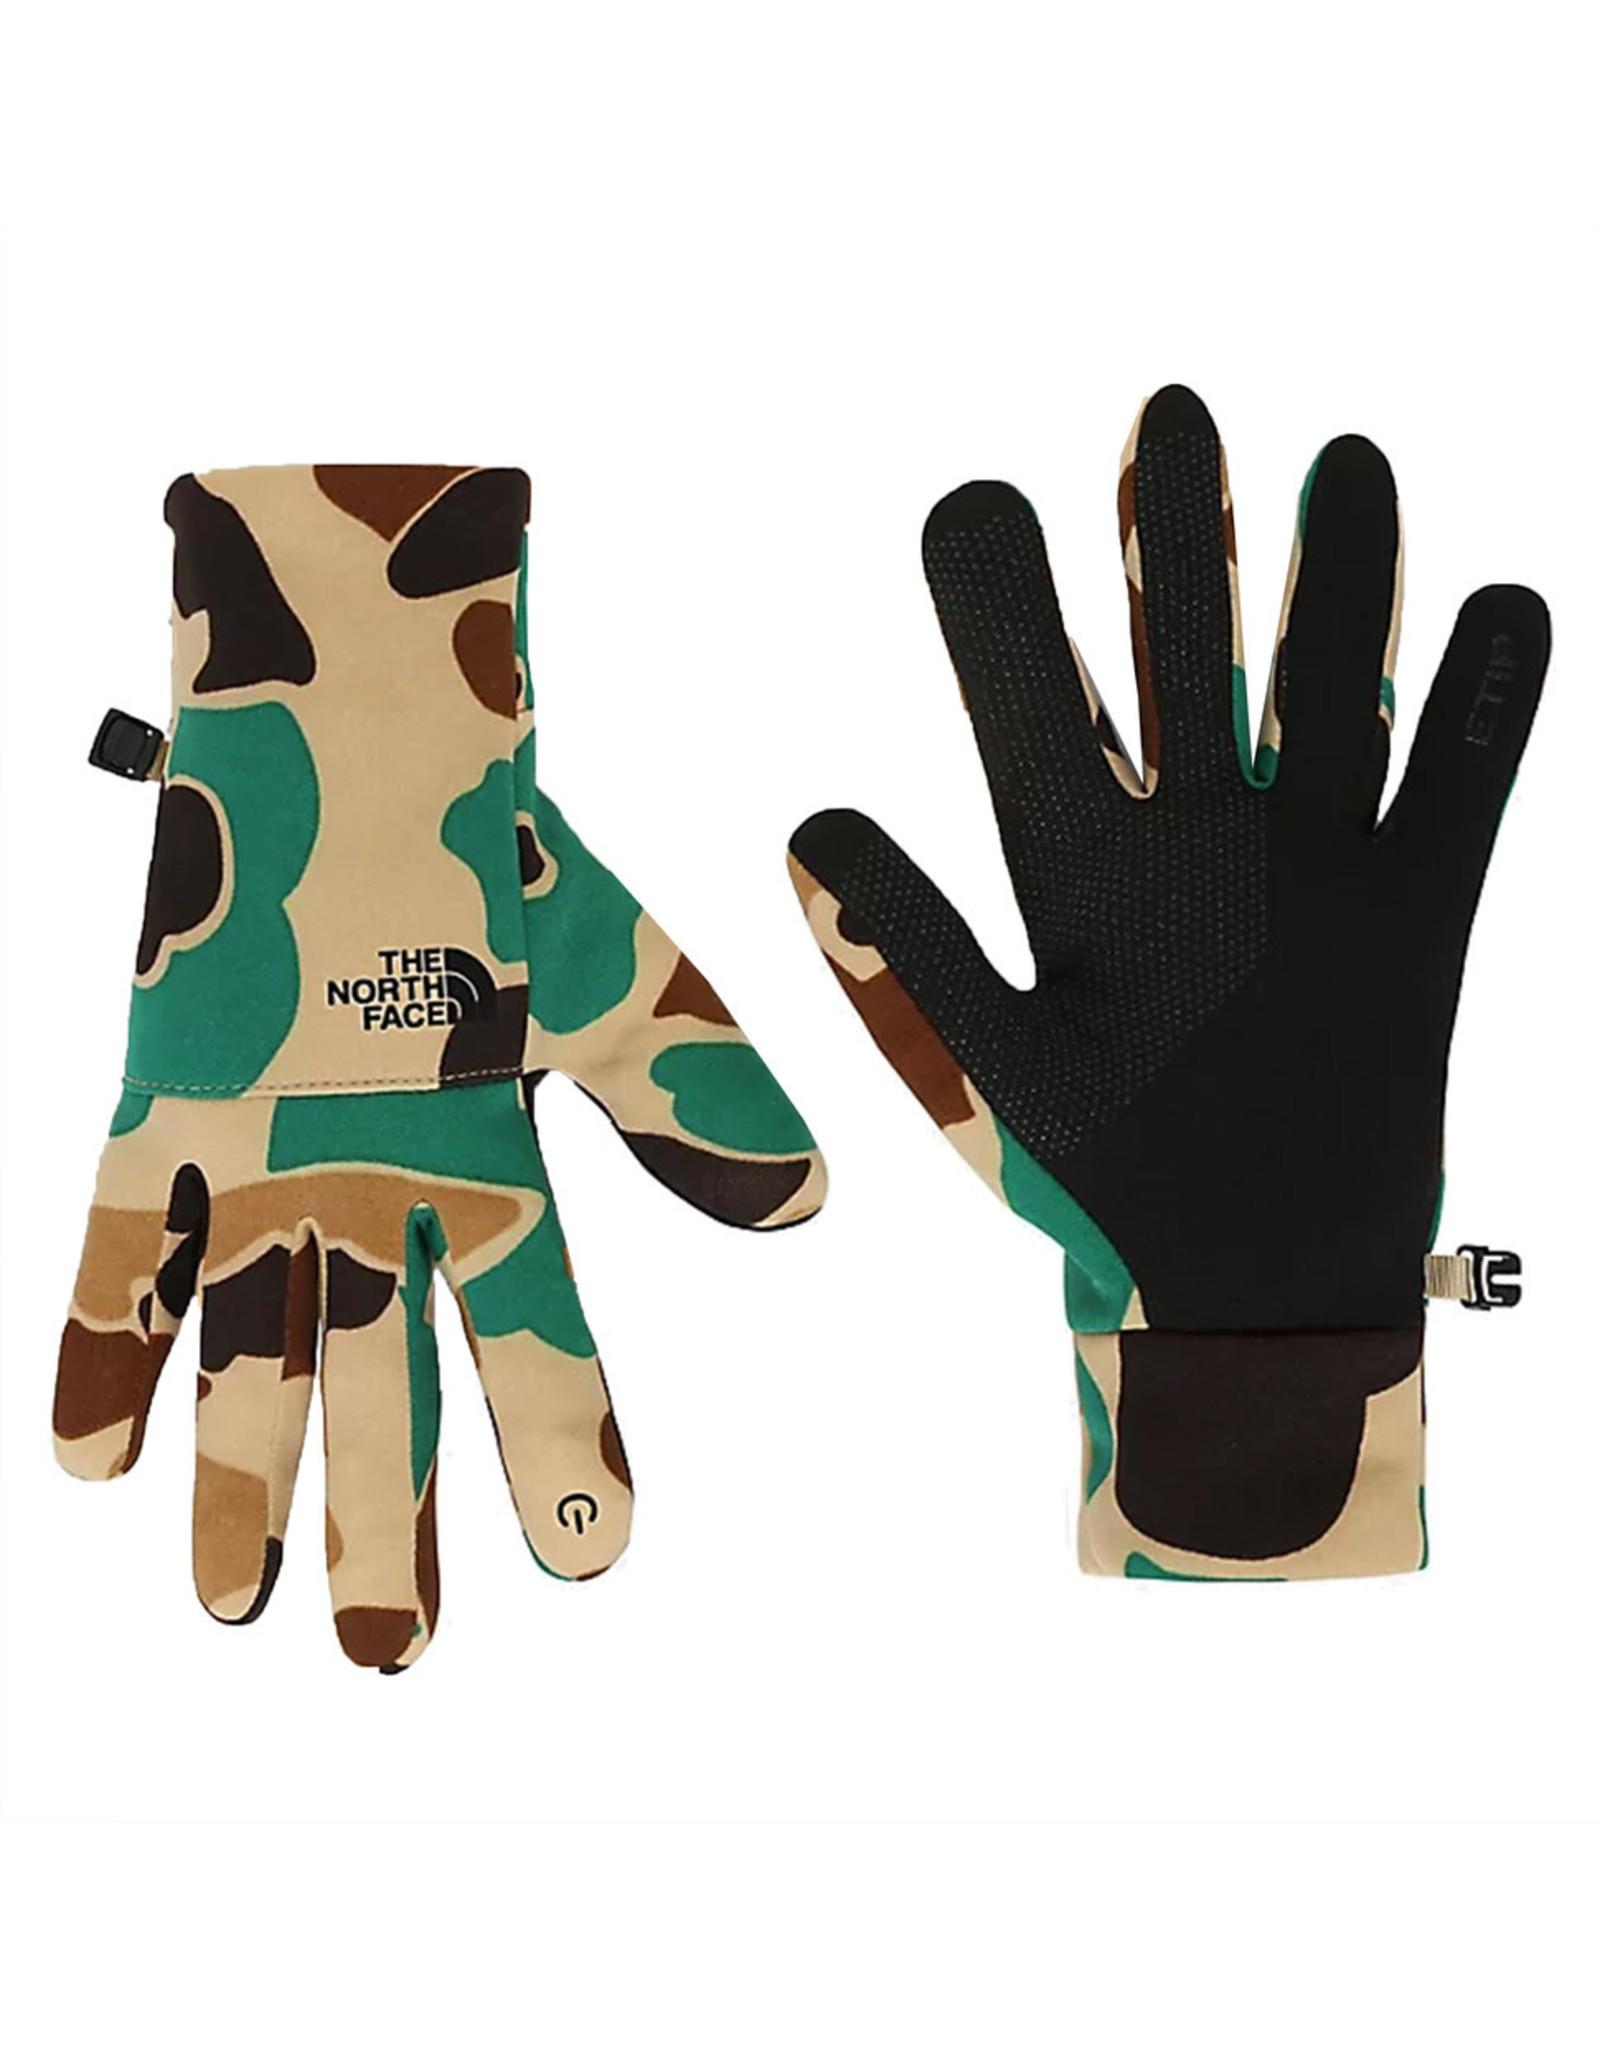 NORTHFACE Etip recycled glove